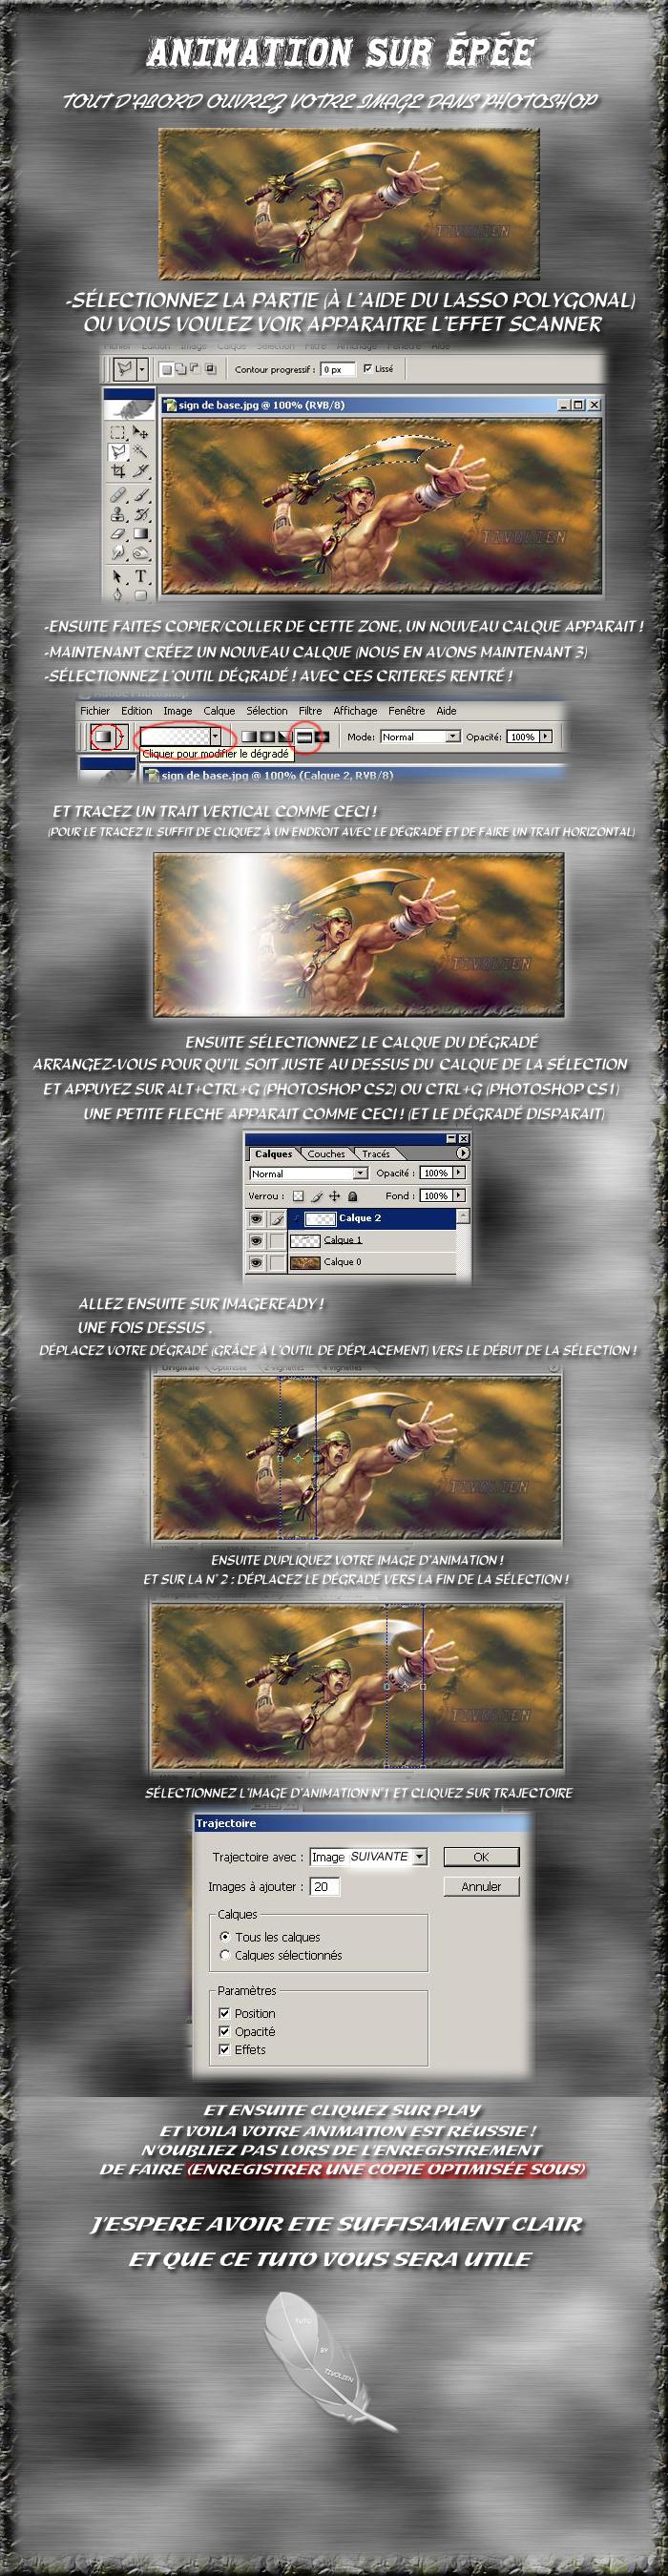 Animation effet reflet 08073105460958772330906